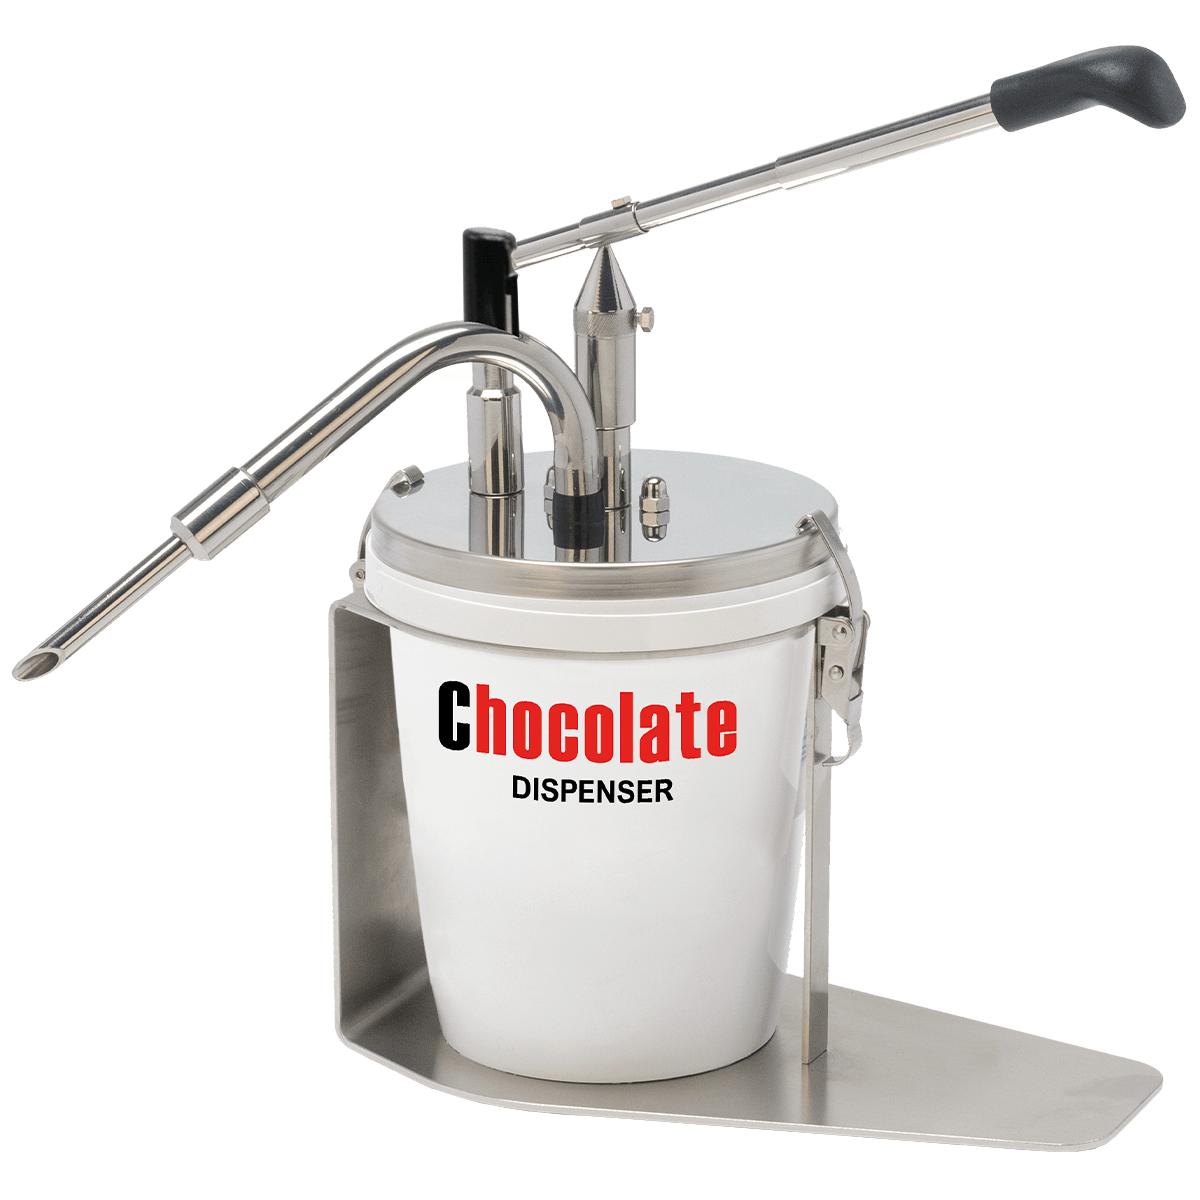 Chocolate / Nutella Lever-action Dispenser